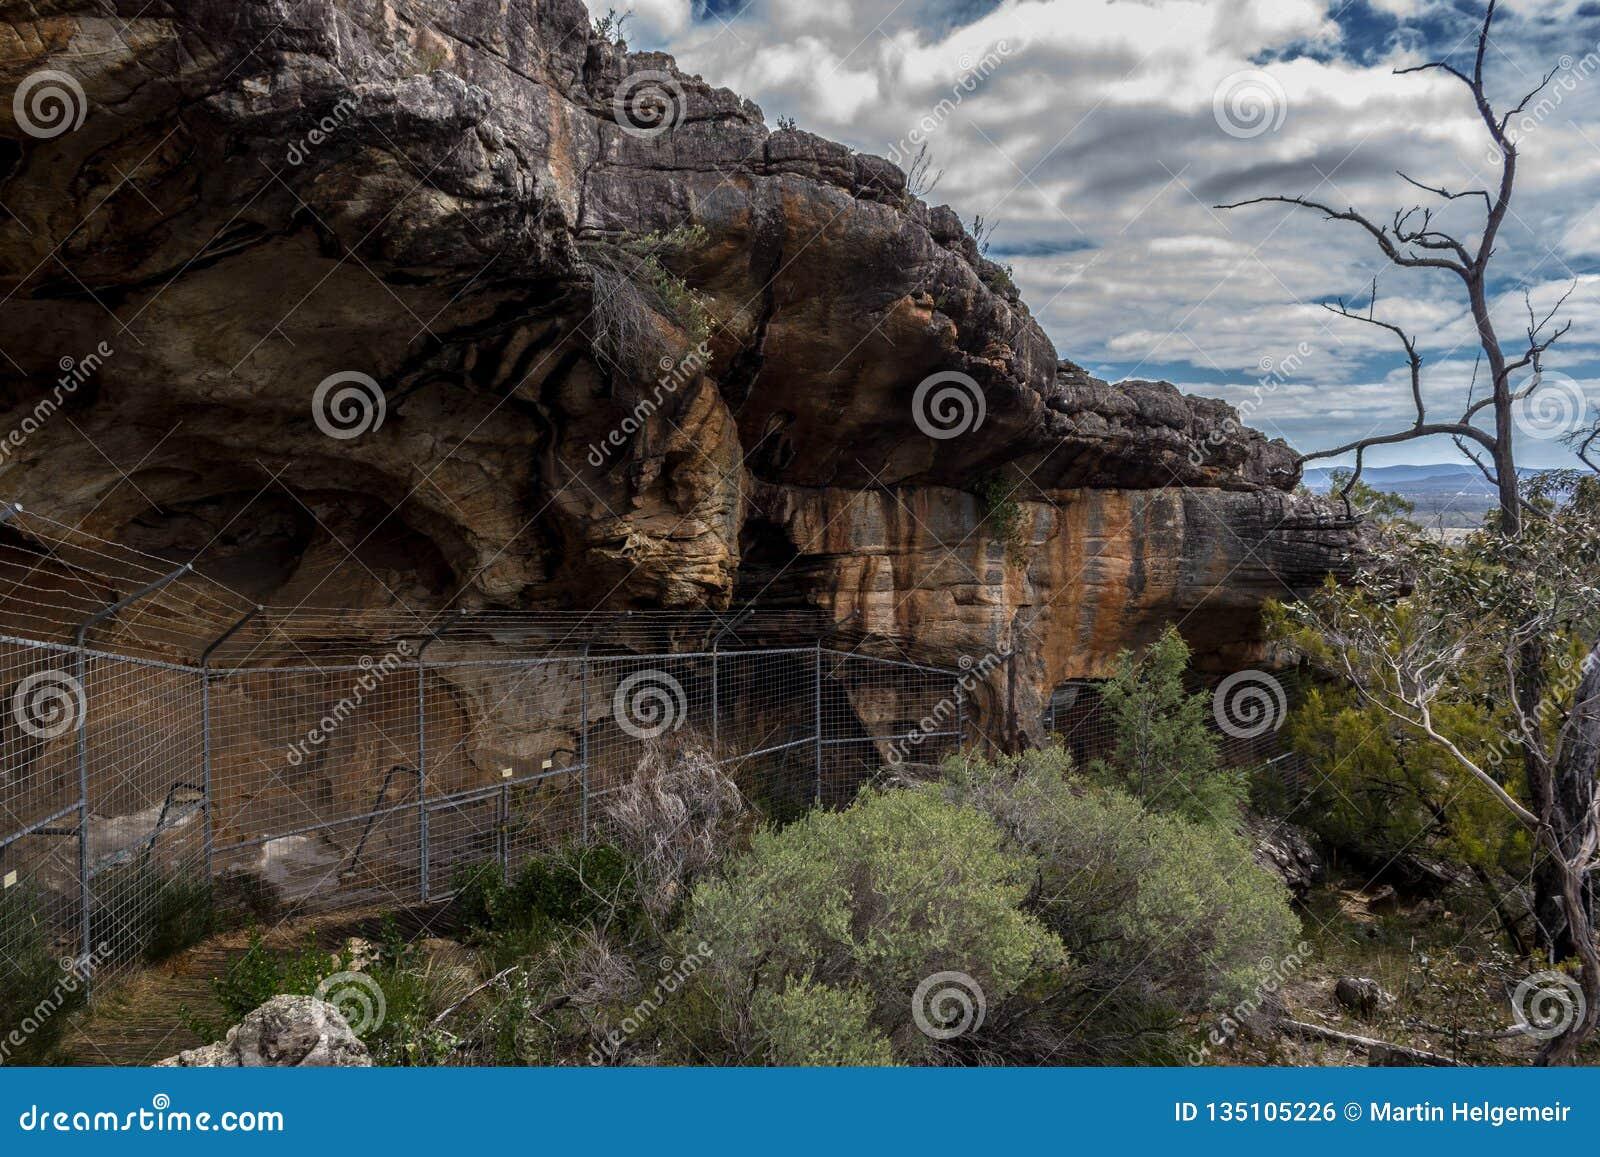 Sikt över en infödd grotta, bak ett staket, i Australien